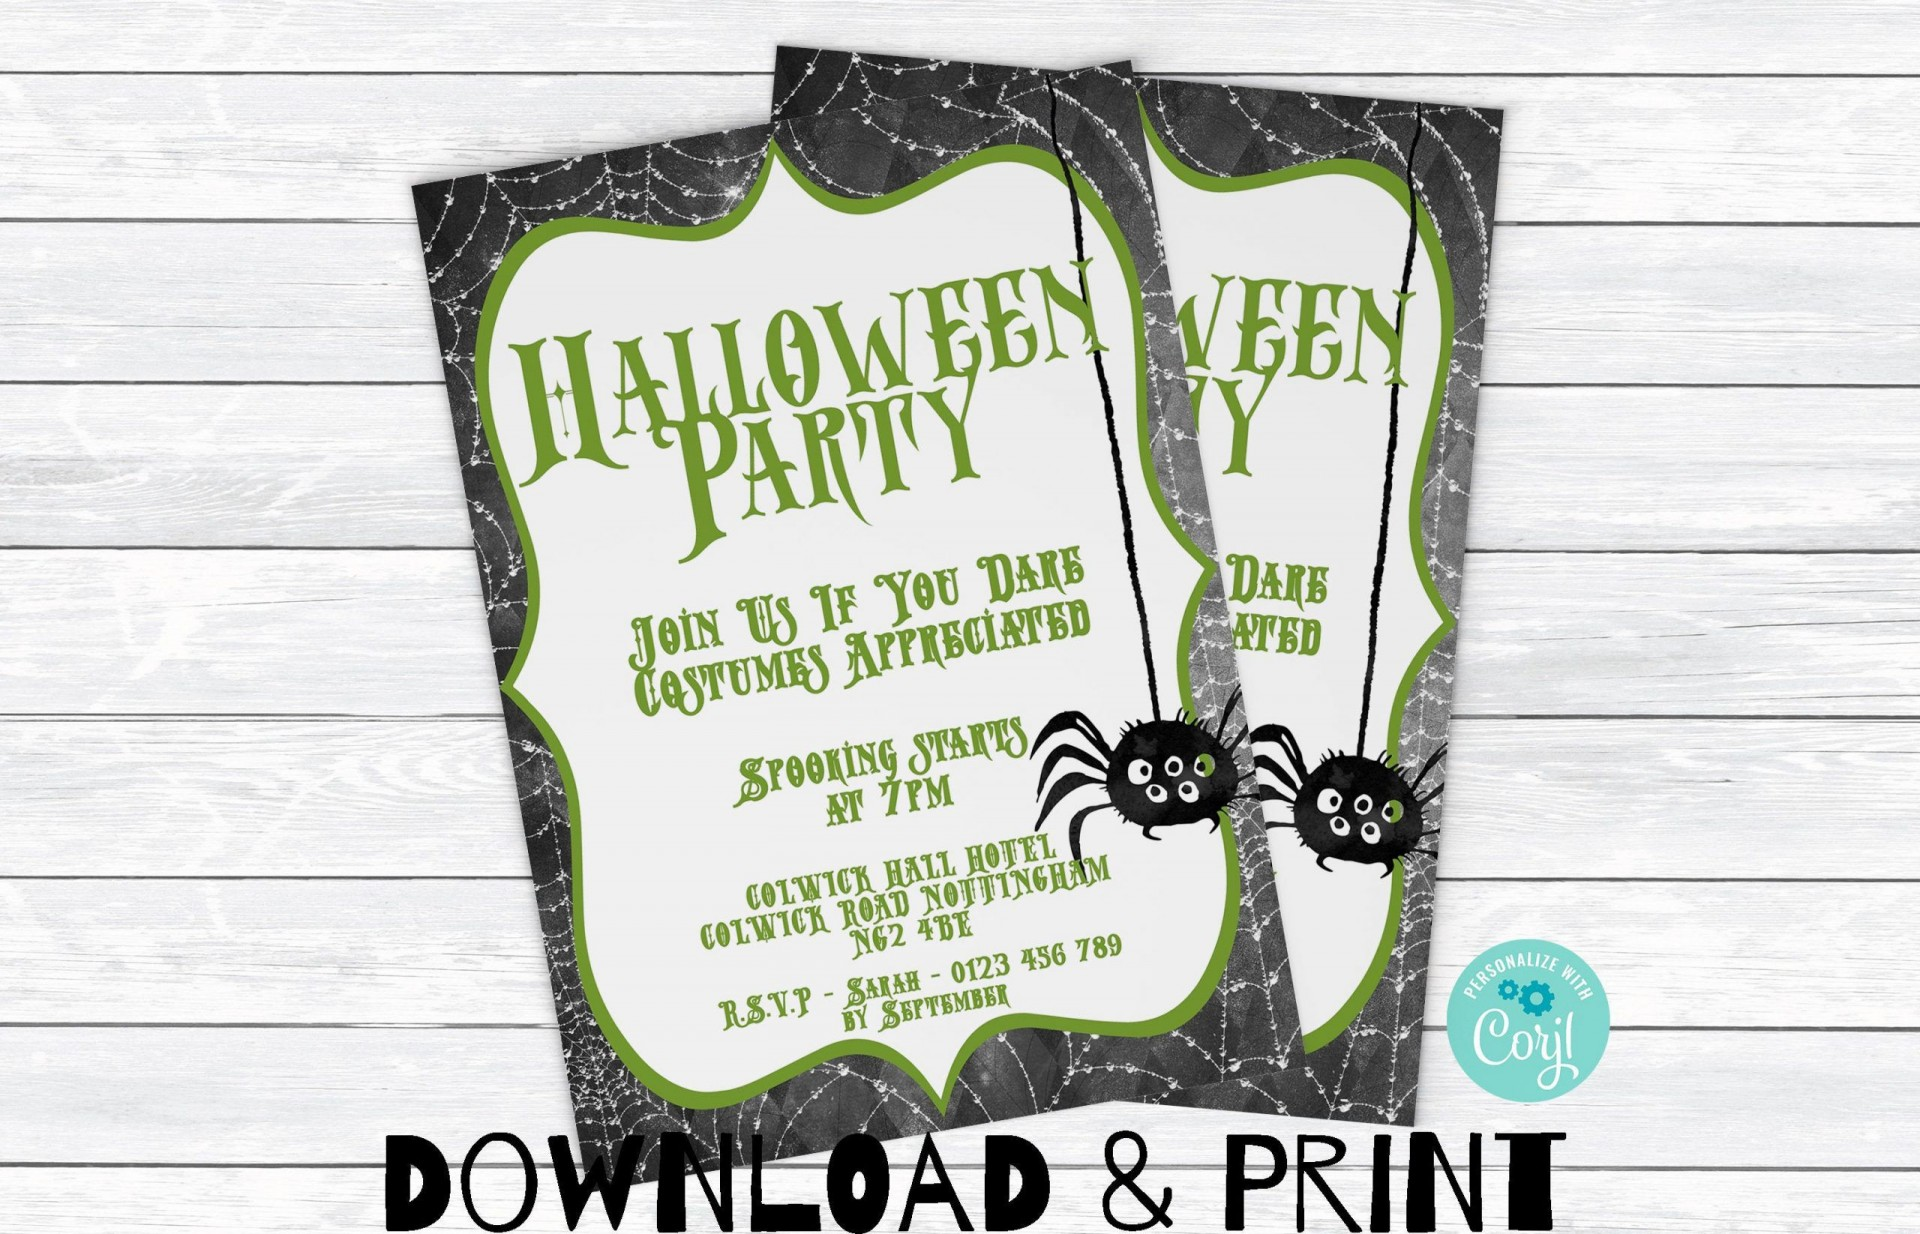 008 Best Halloween Party Invitation Template High Def  Microsoft Block October1920